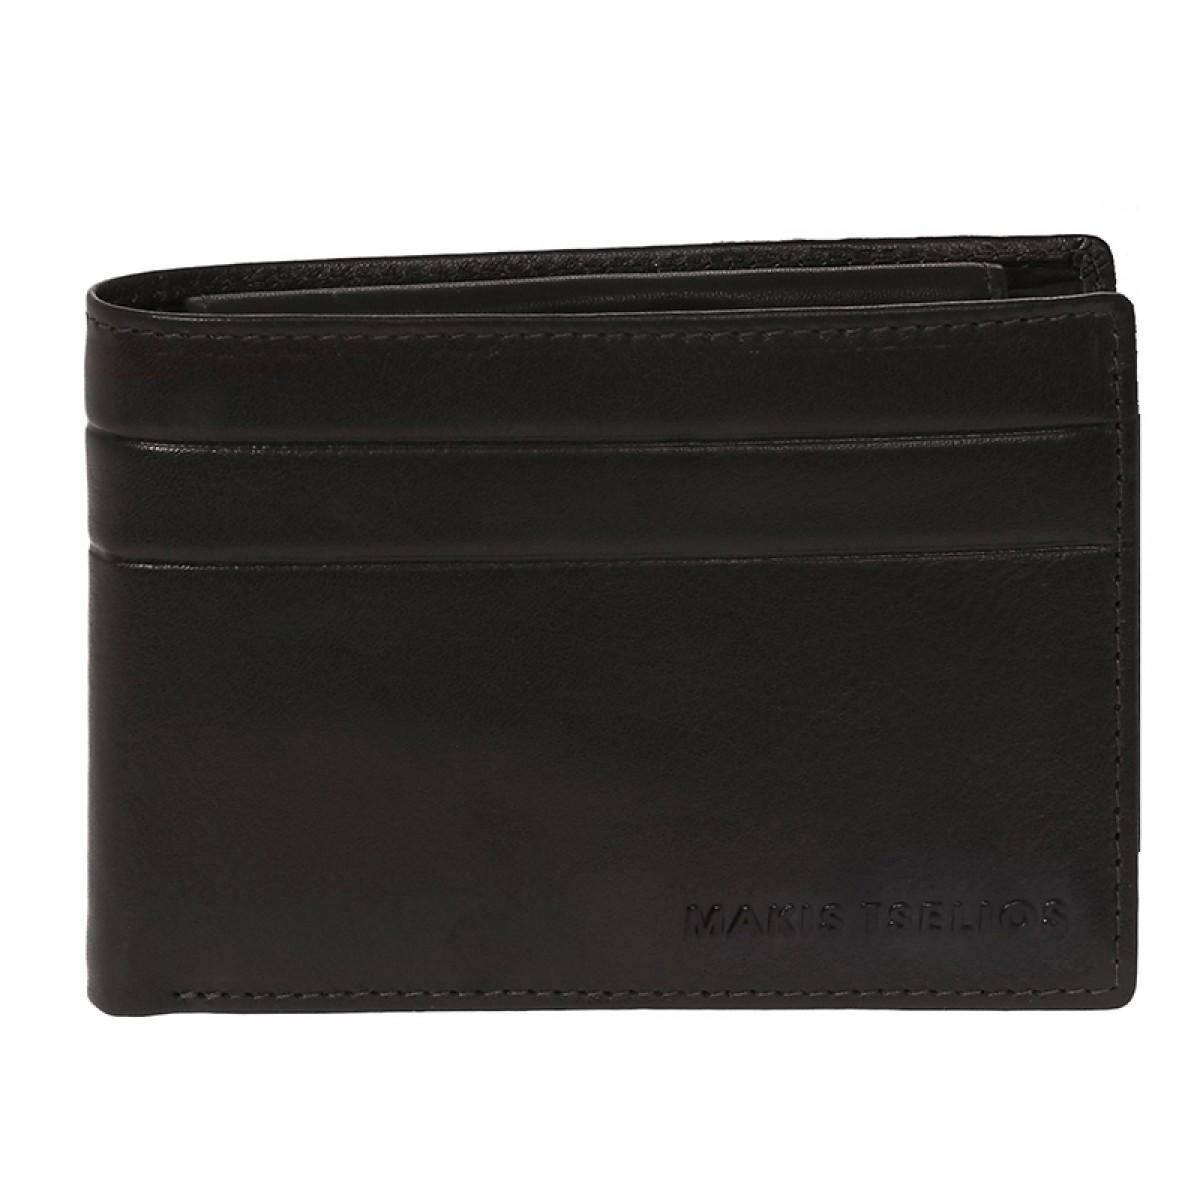 1aaa6307c0 Δερμάτινο ανδρικό πορτοφόλι ΜΑΚΗΣ ΤΣΕΛΙΟΣ σε μαύρο χρώμα με RFID προστασία  (6-811BL)